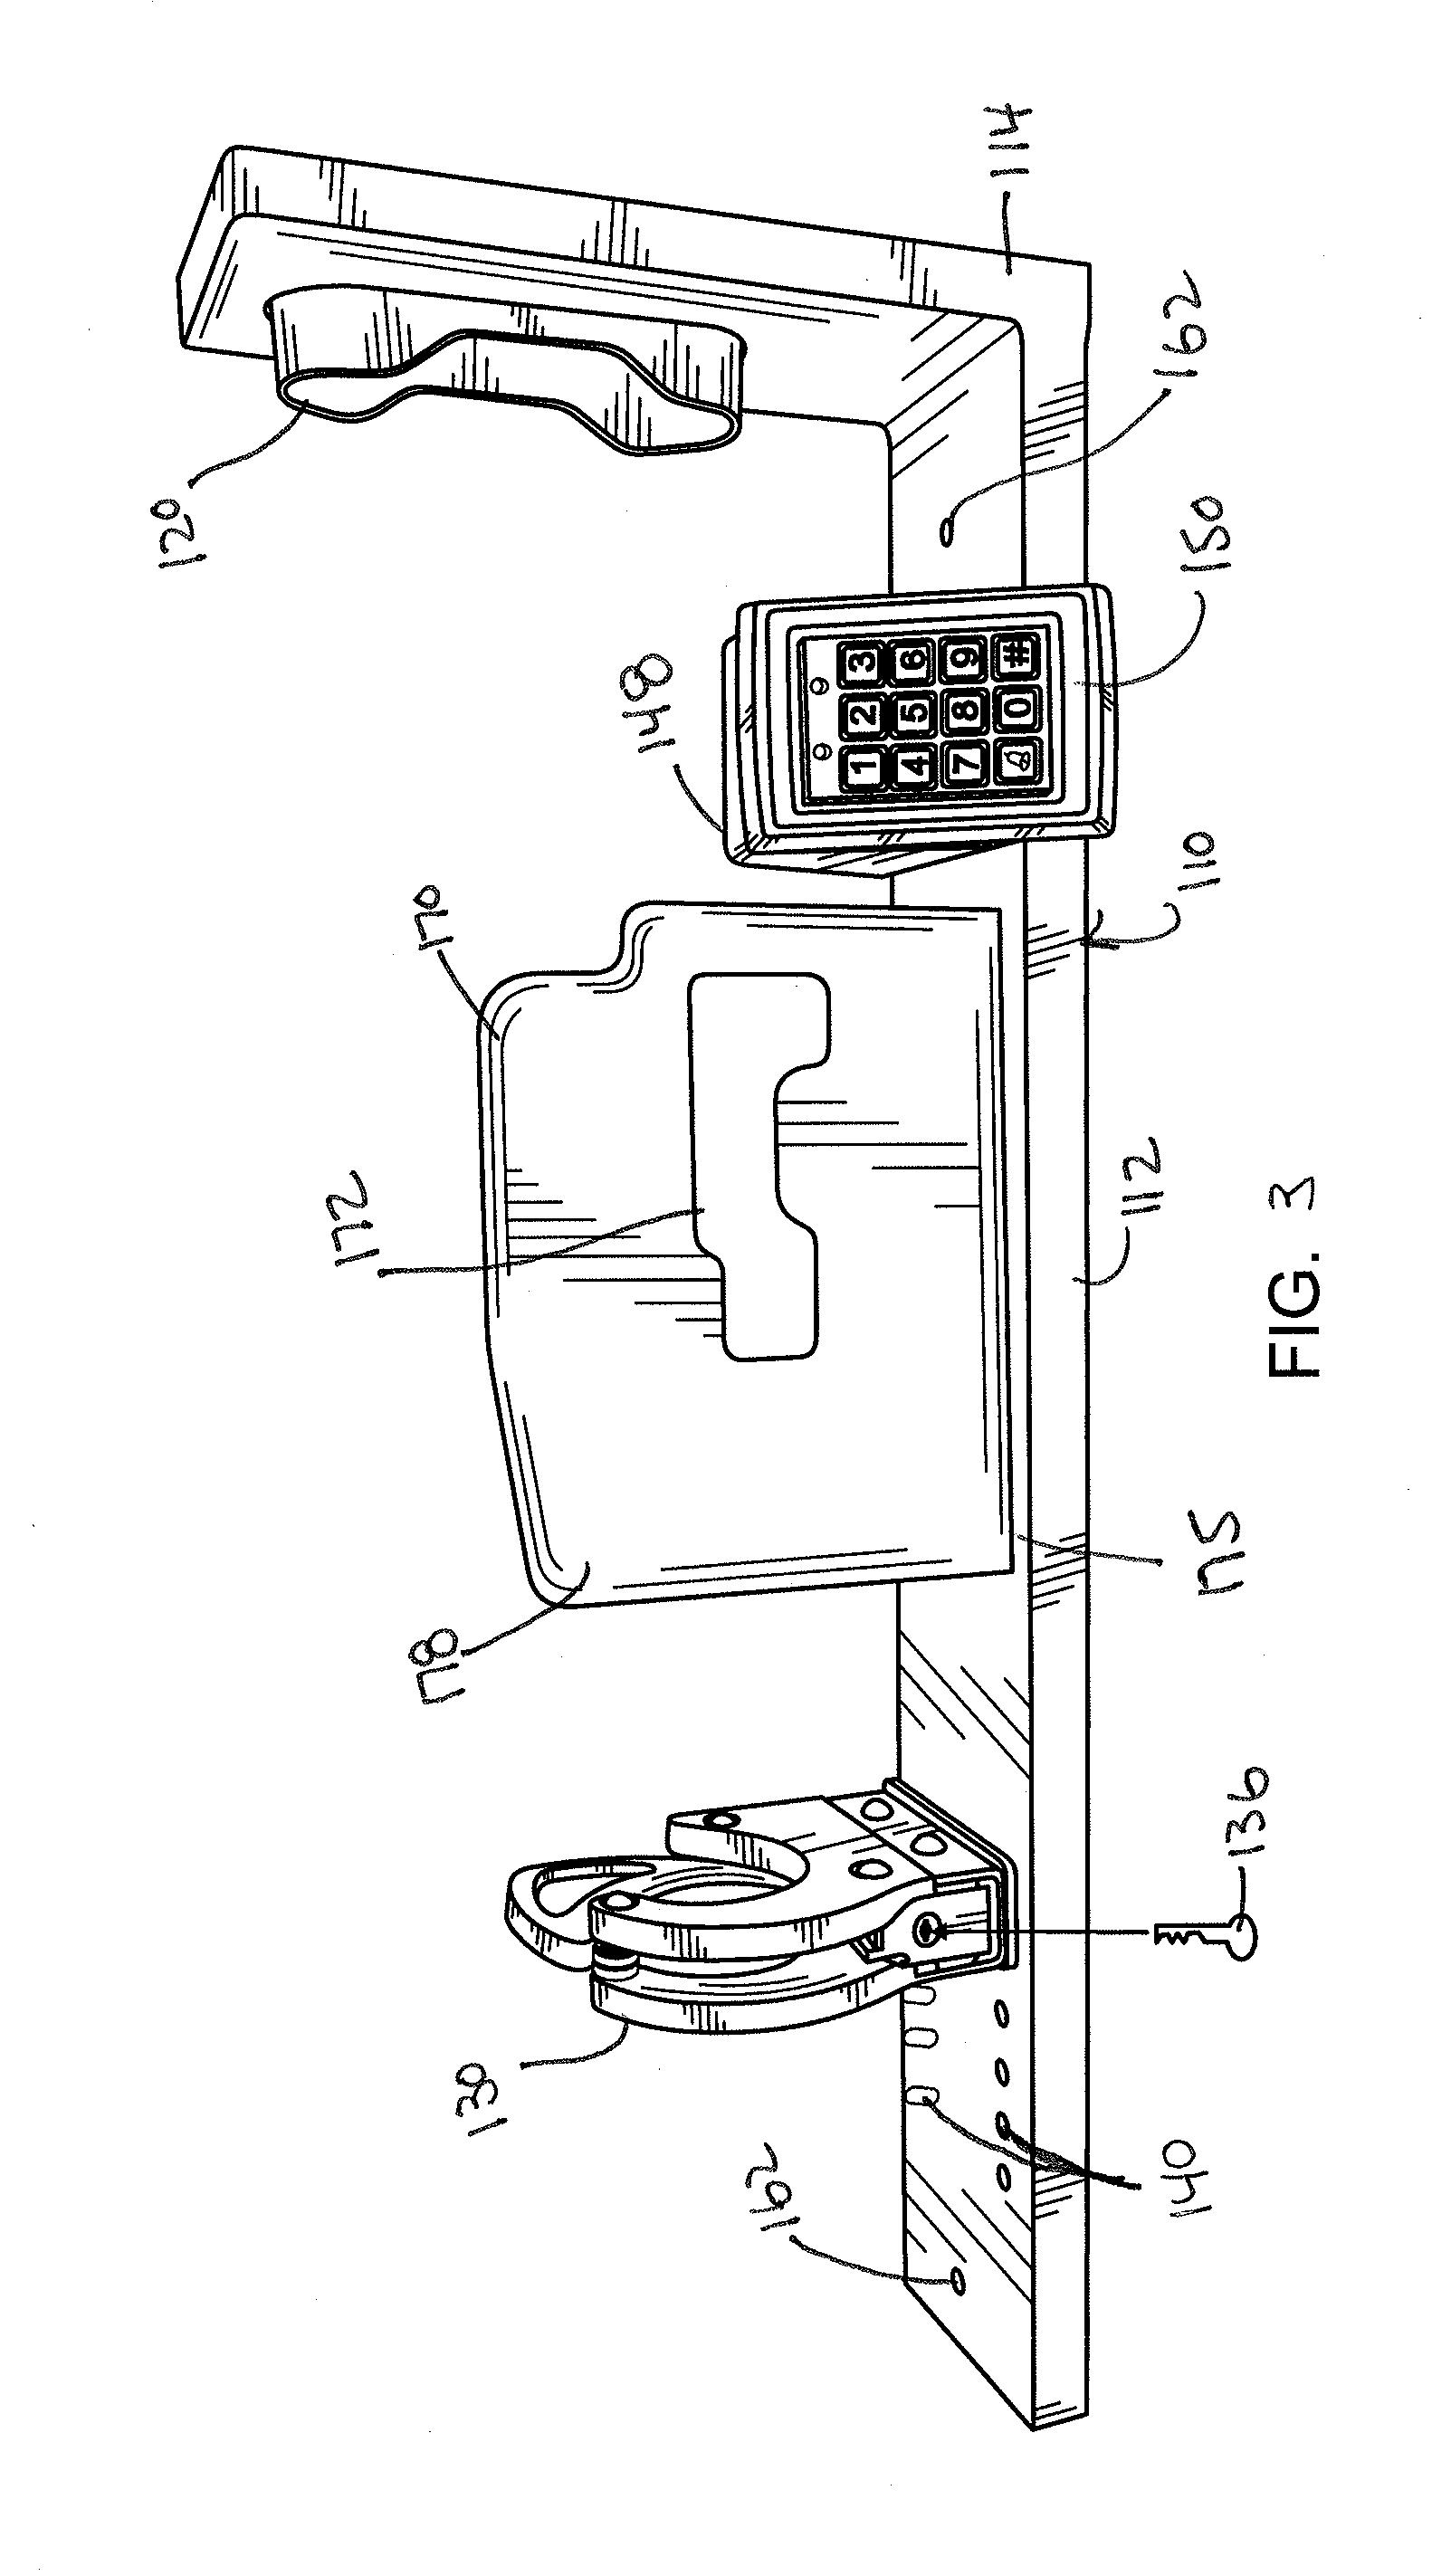 Santa Cruz Gun Lock Wiring Diagram : 34 Wiring Diagram